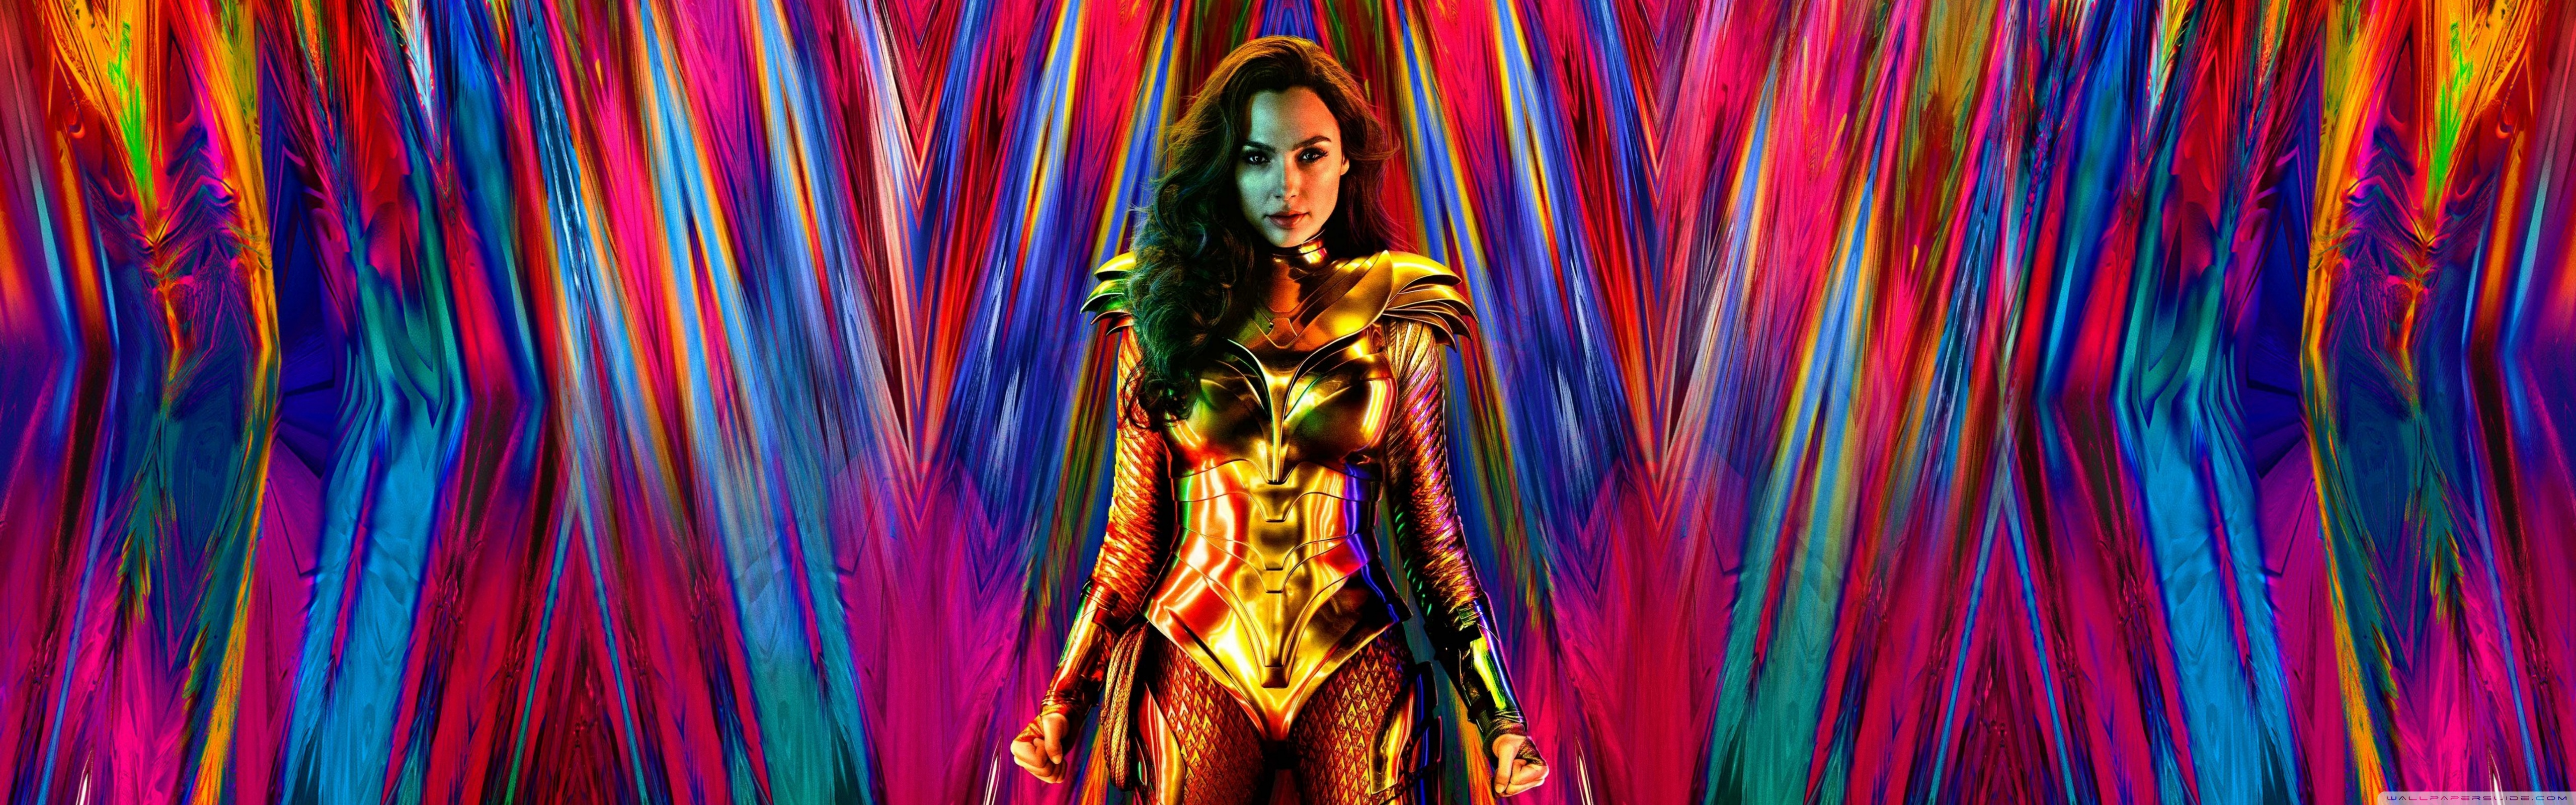 Wonder Woman 1984 Movie 2020 Ultra HD Desktop Background Wallpaper 5120x1600